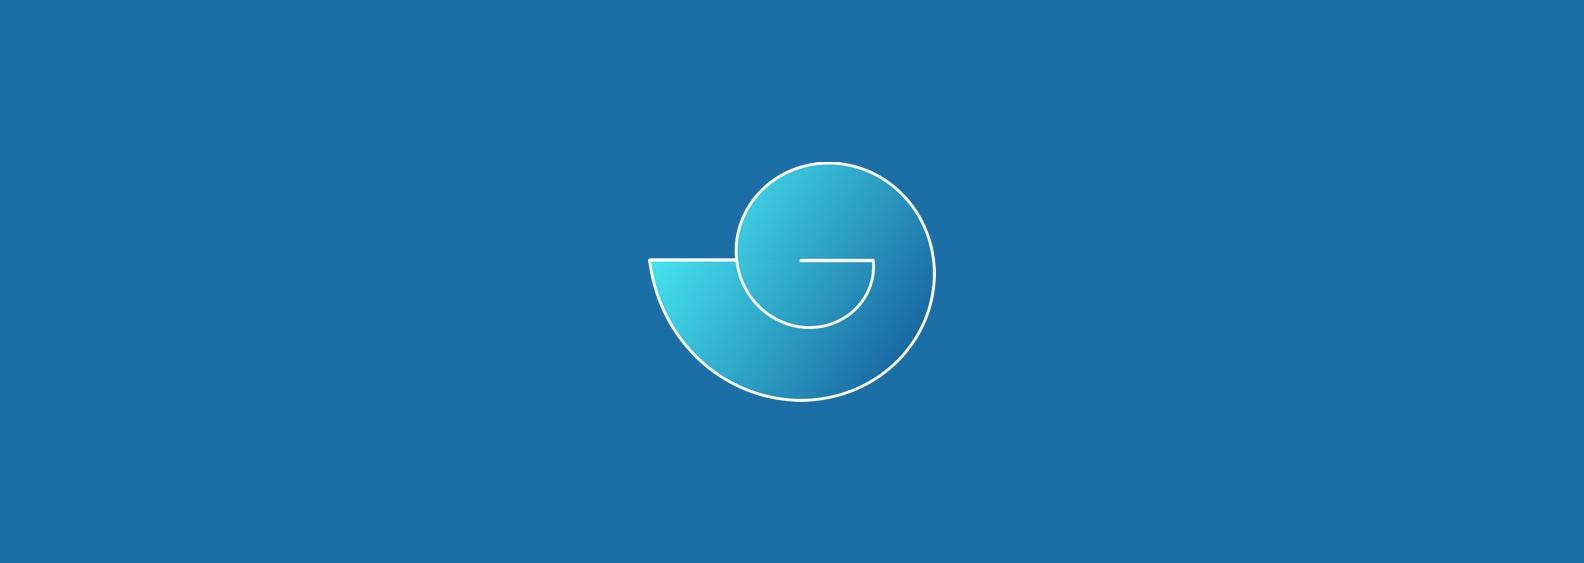 GB+Hero+Image+2.jpg